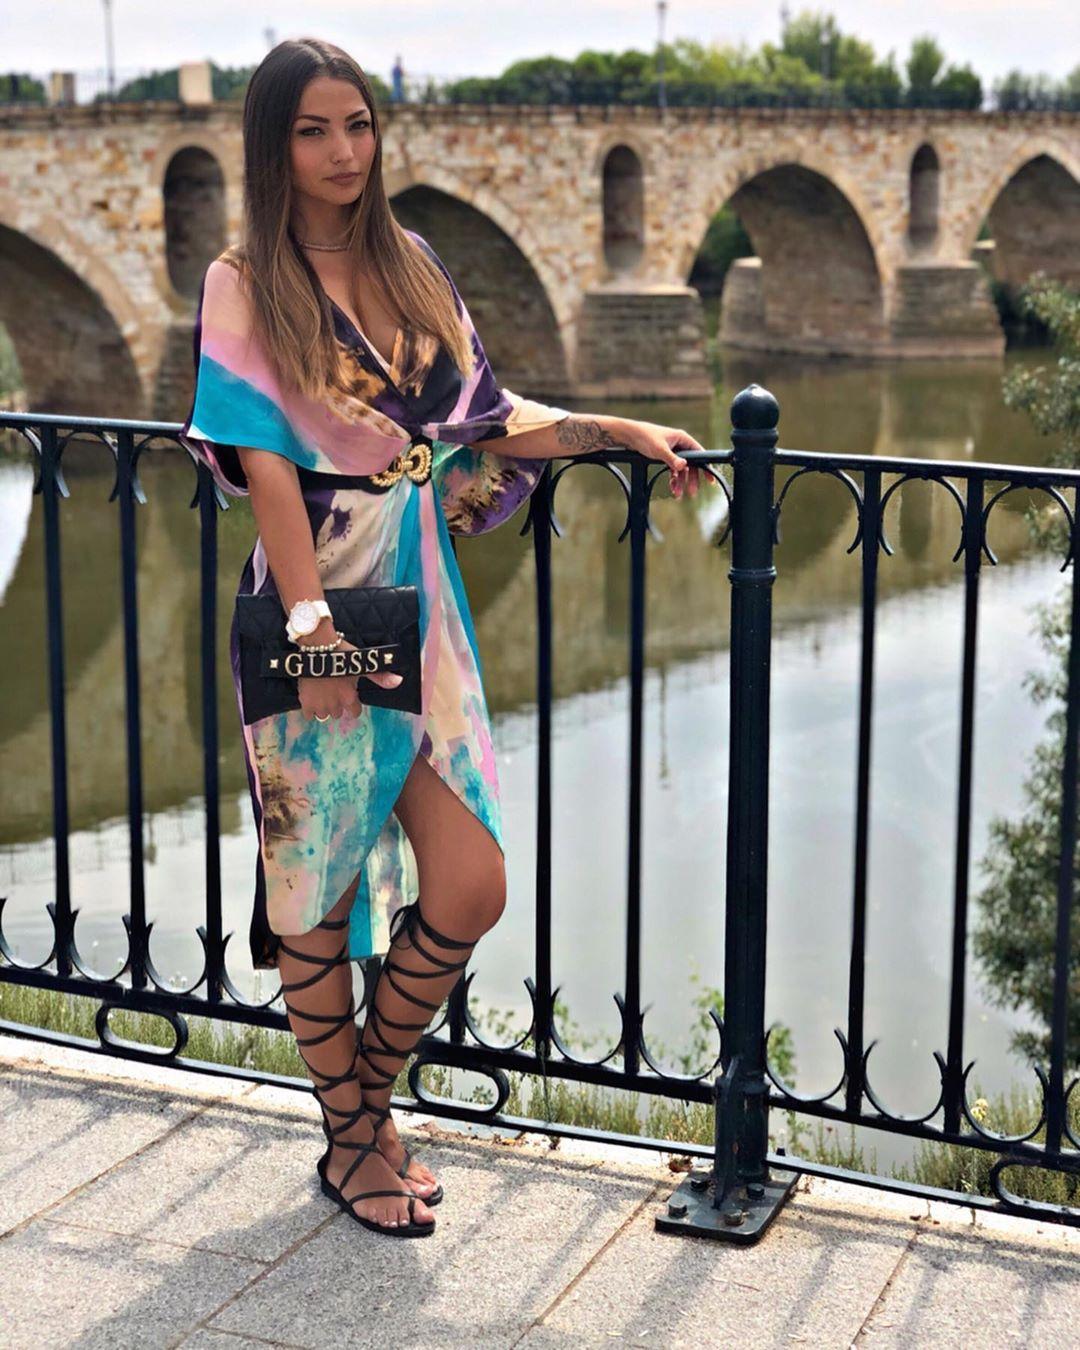 Rincones bonitos de Zamora. . #notredame #travel #travelgram #fitness #fit #fitnessmodel #fitnessadd...